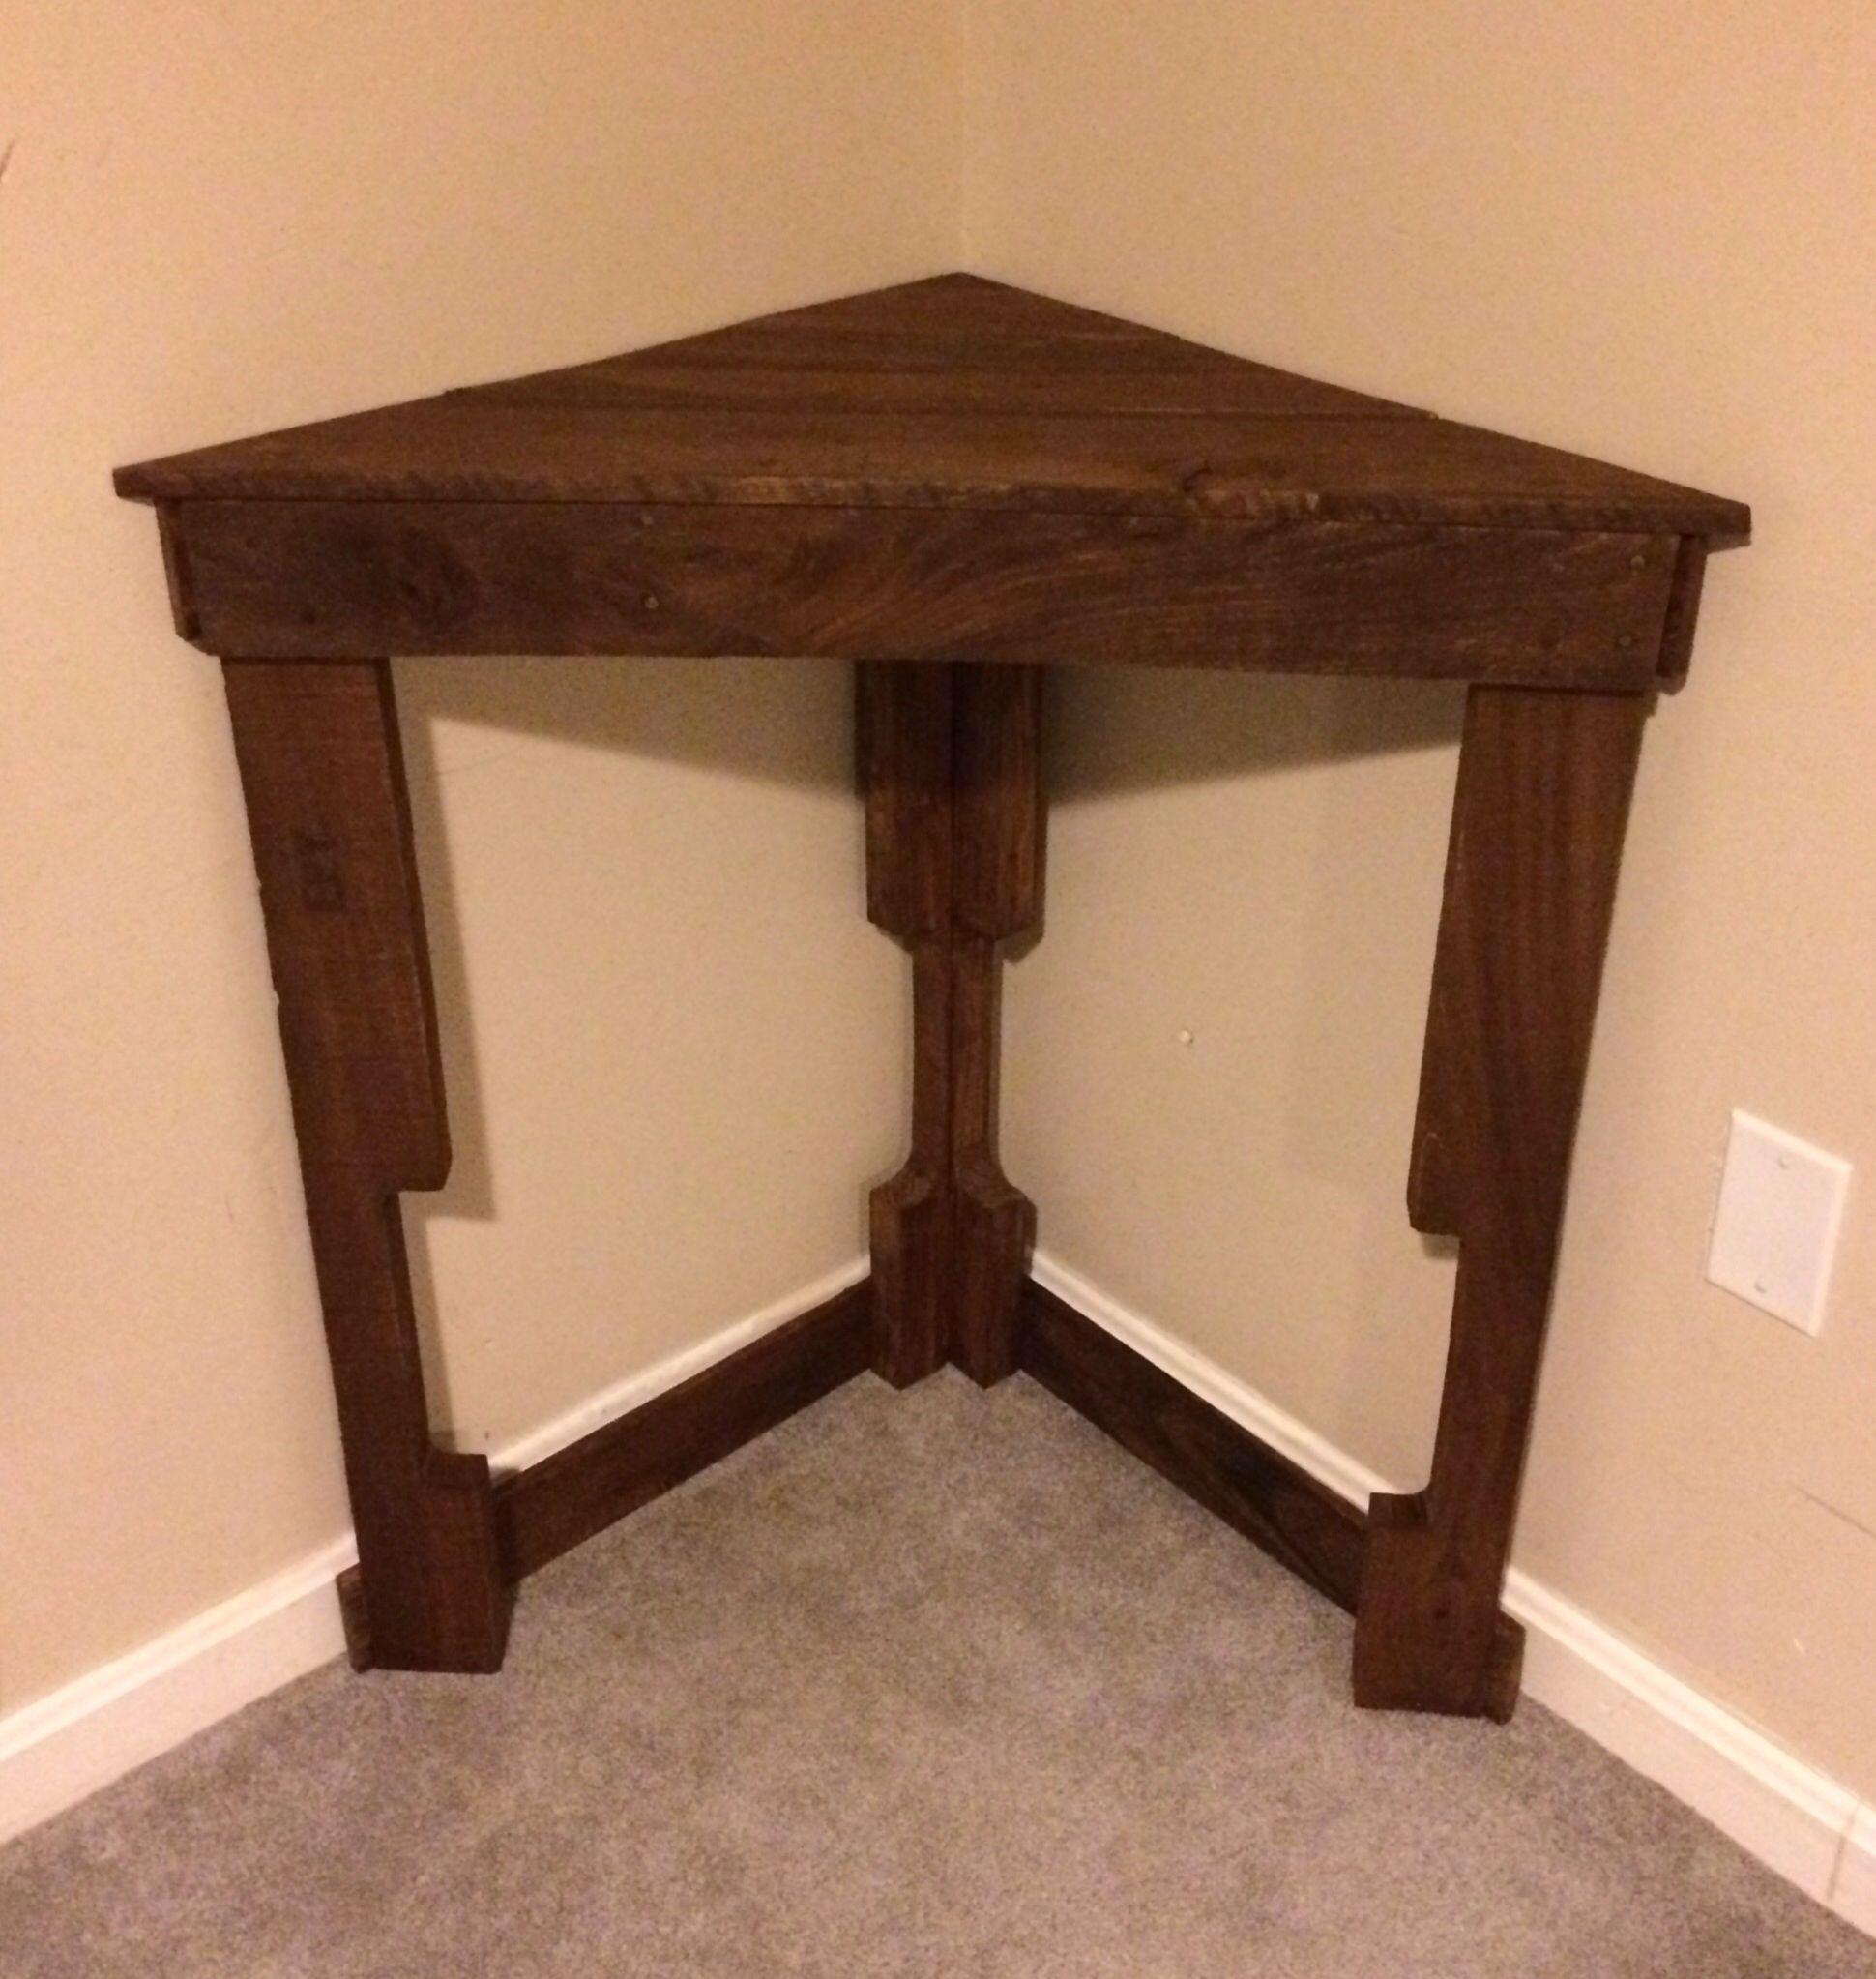 Pallet corner table crafty beeotch pinterest for Pallet corner bench